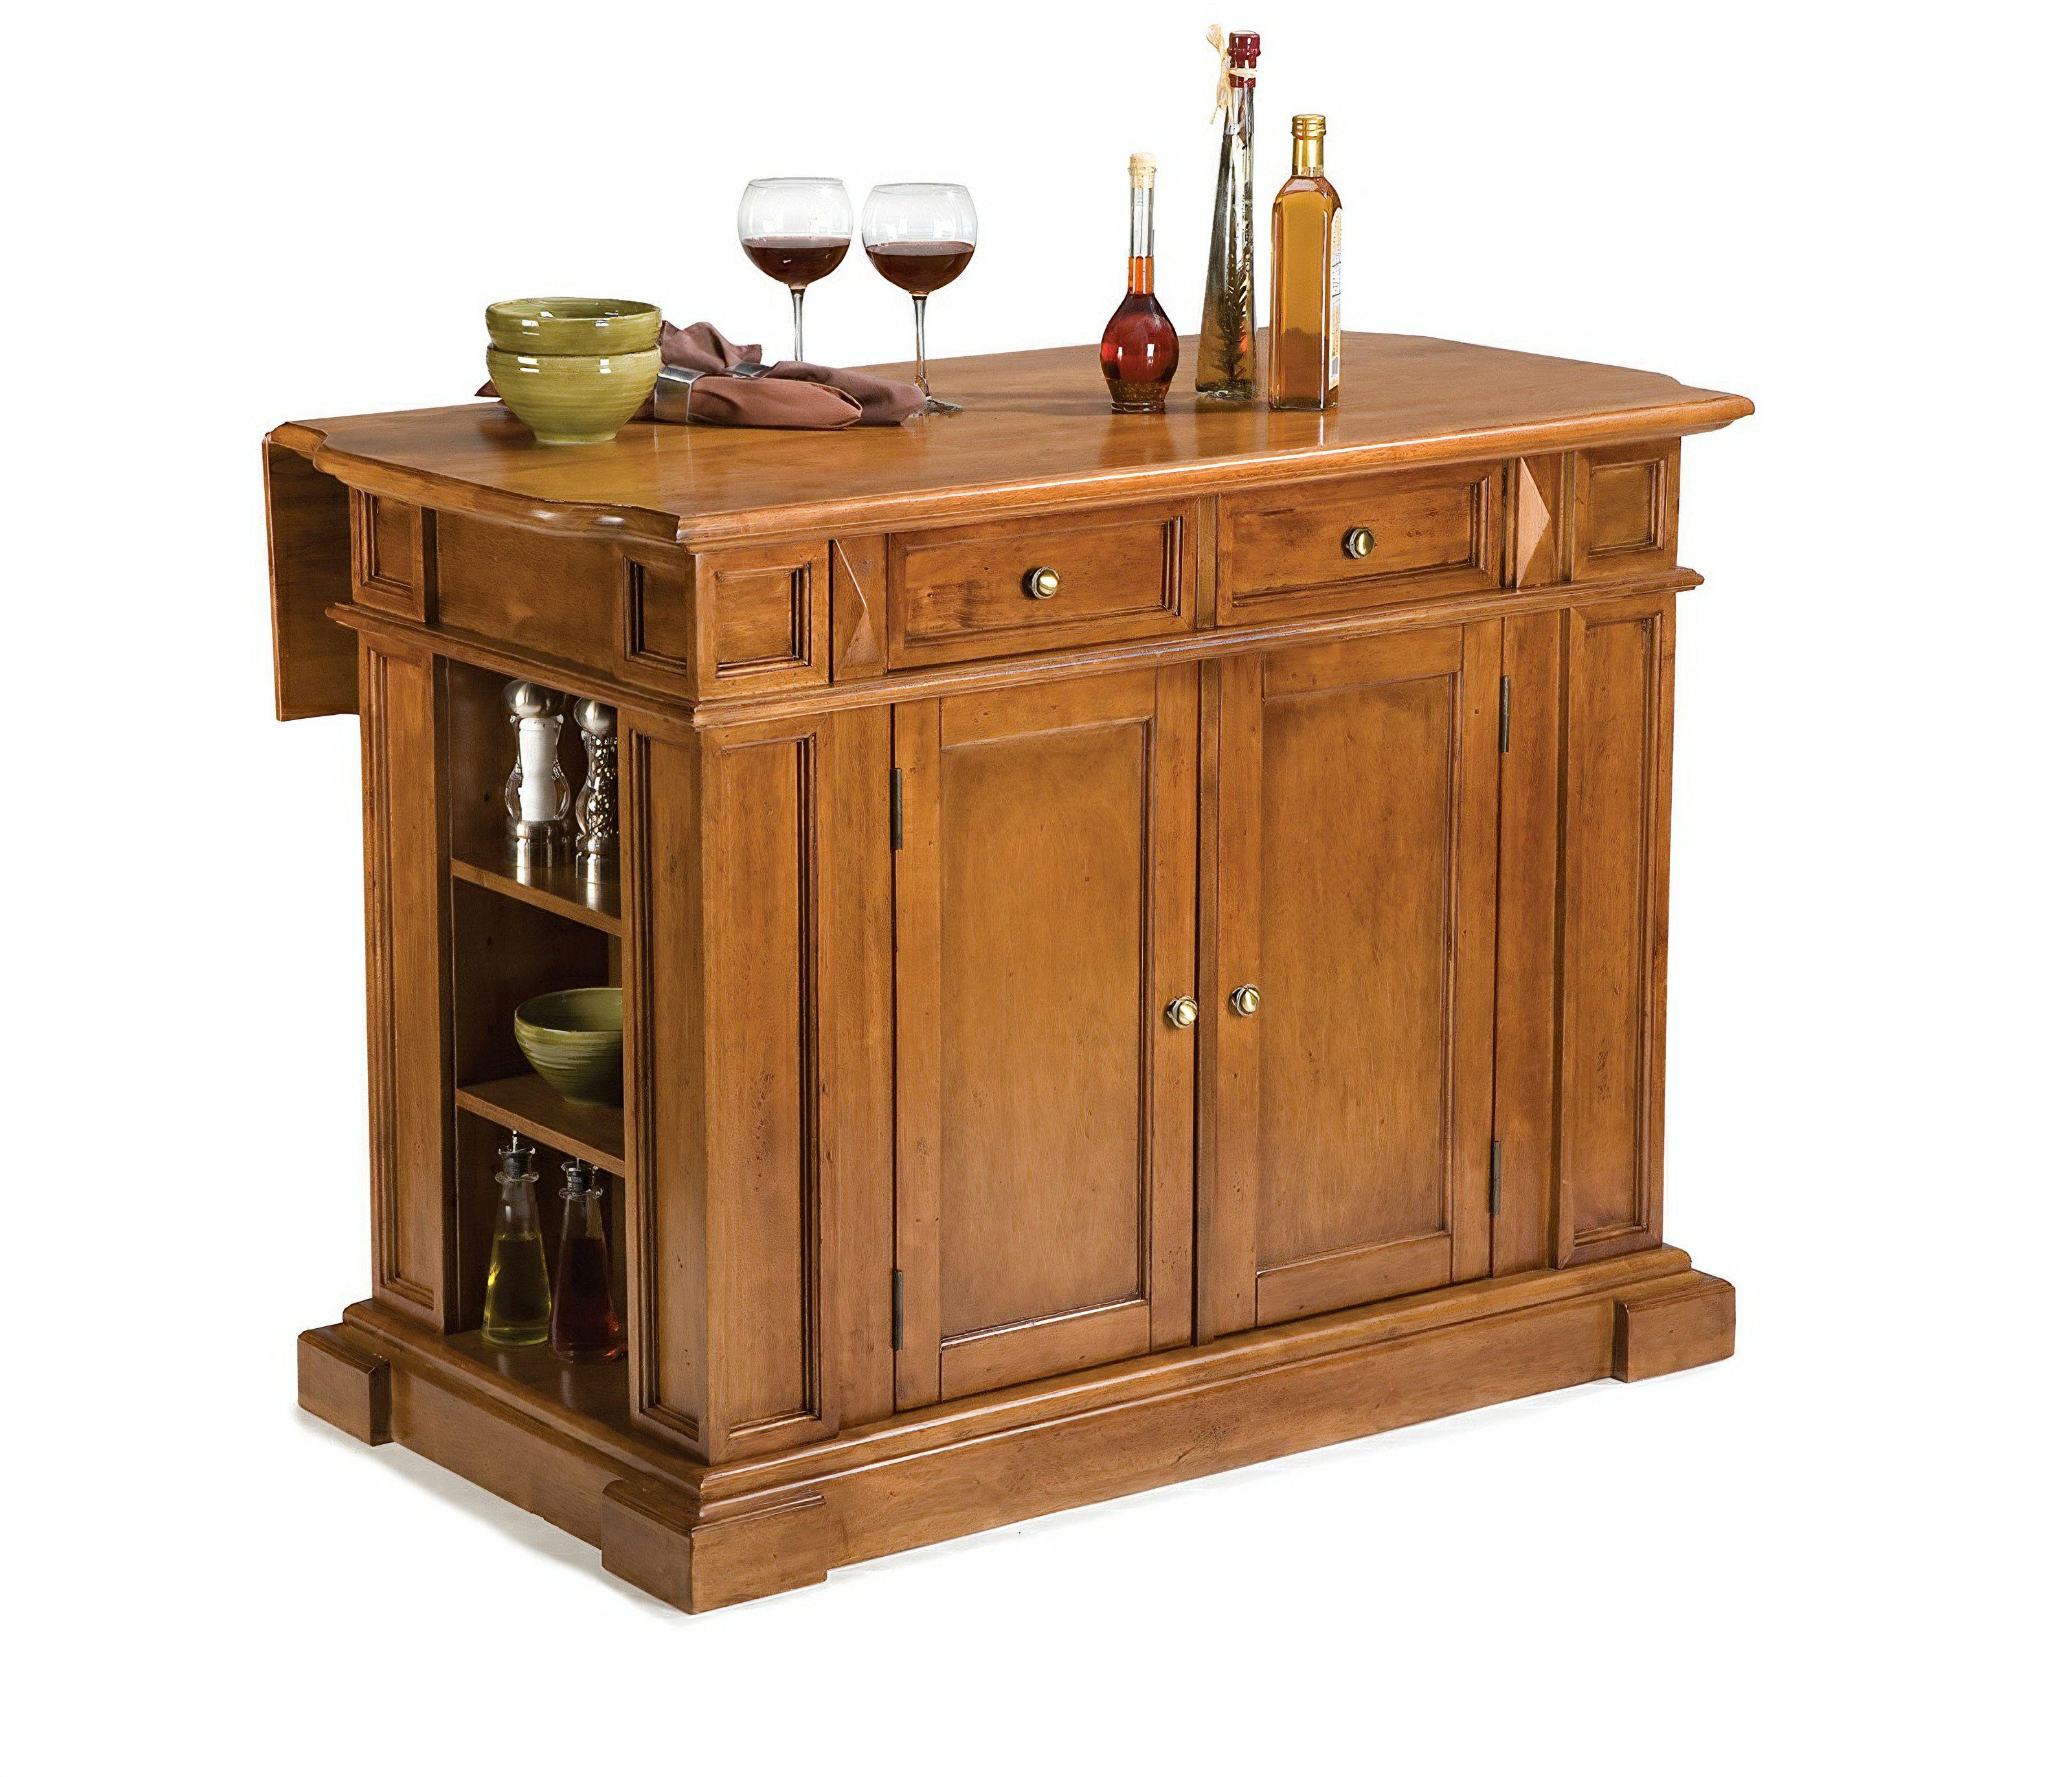 Americana Oak Kitchen Island By Home Styles In 2021 Kitchen Styling Home Styles Home Depot Kitchen